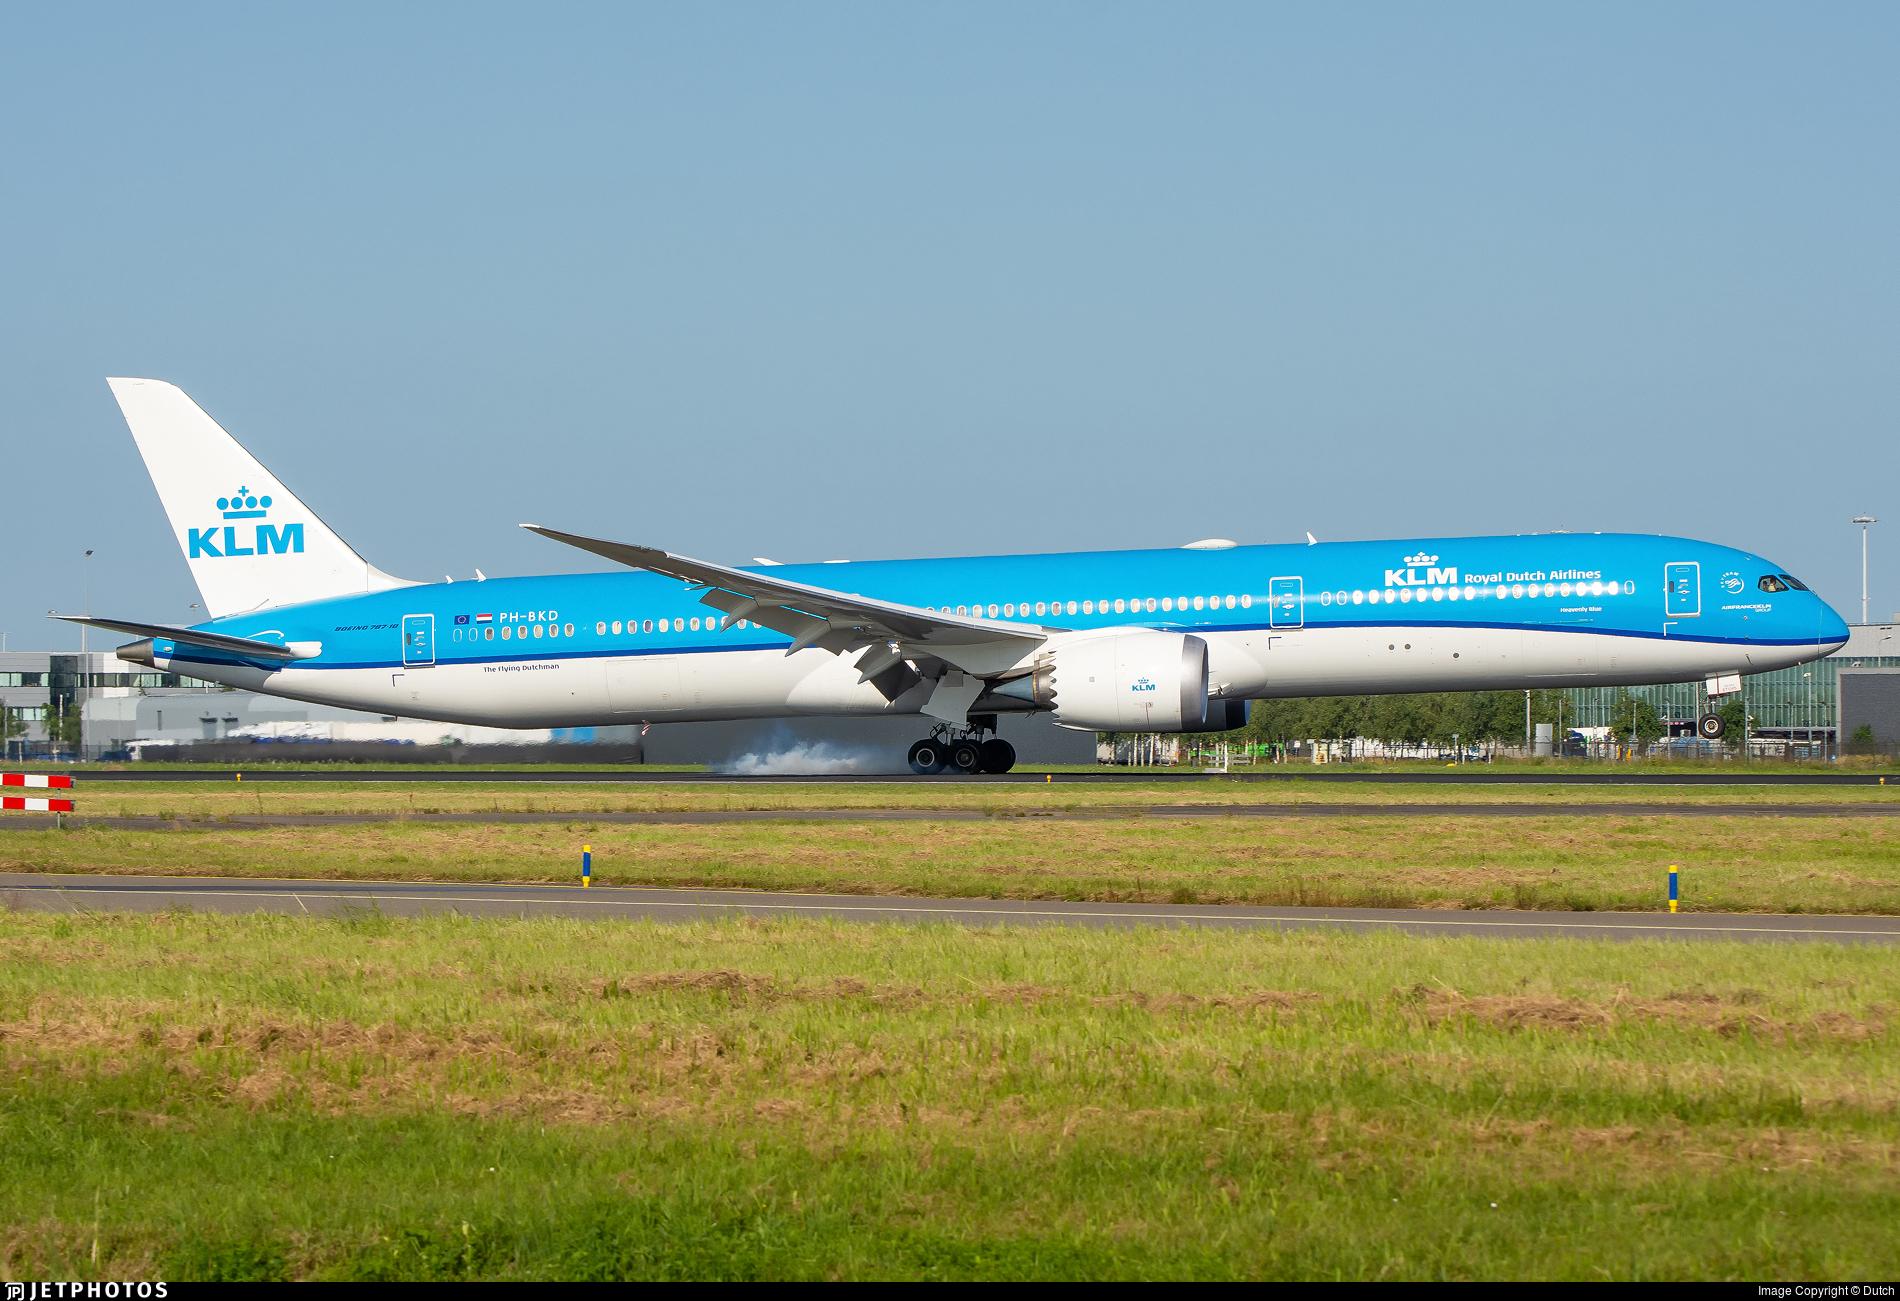 PH-BKD - Boeing 787-10 Dreamliner - KLM Royal Dutch Airlines